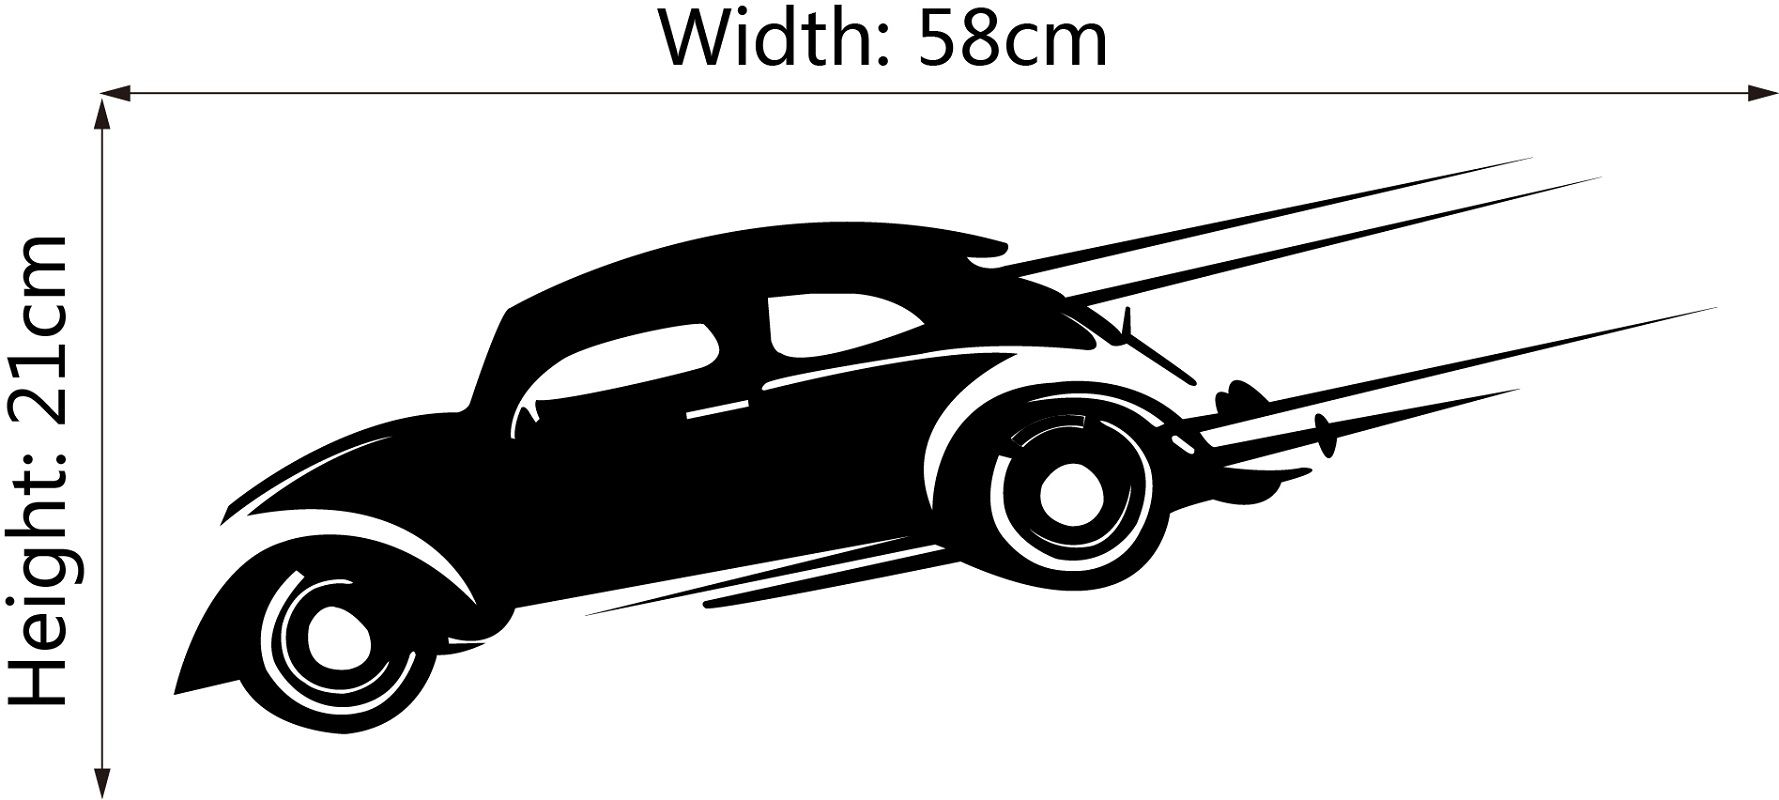 DSU Speeding Car Simple Art Wall Stickers